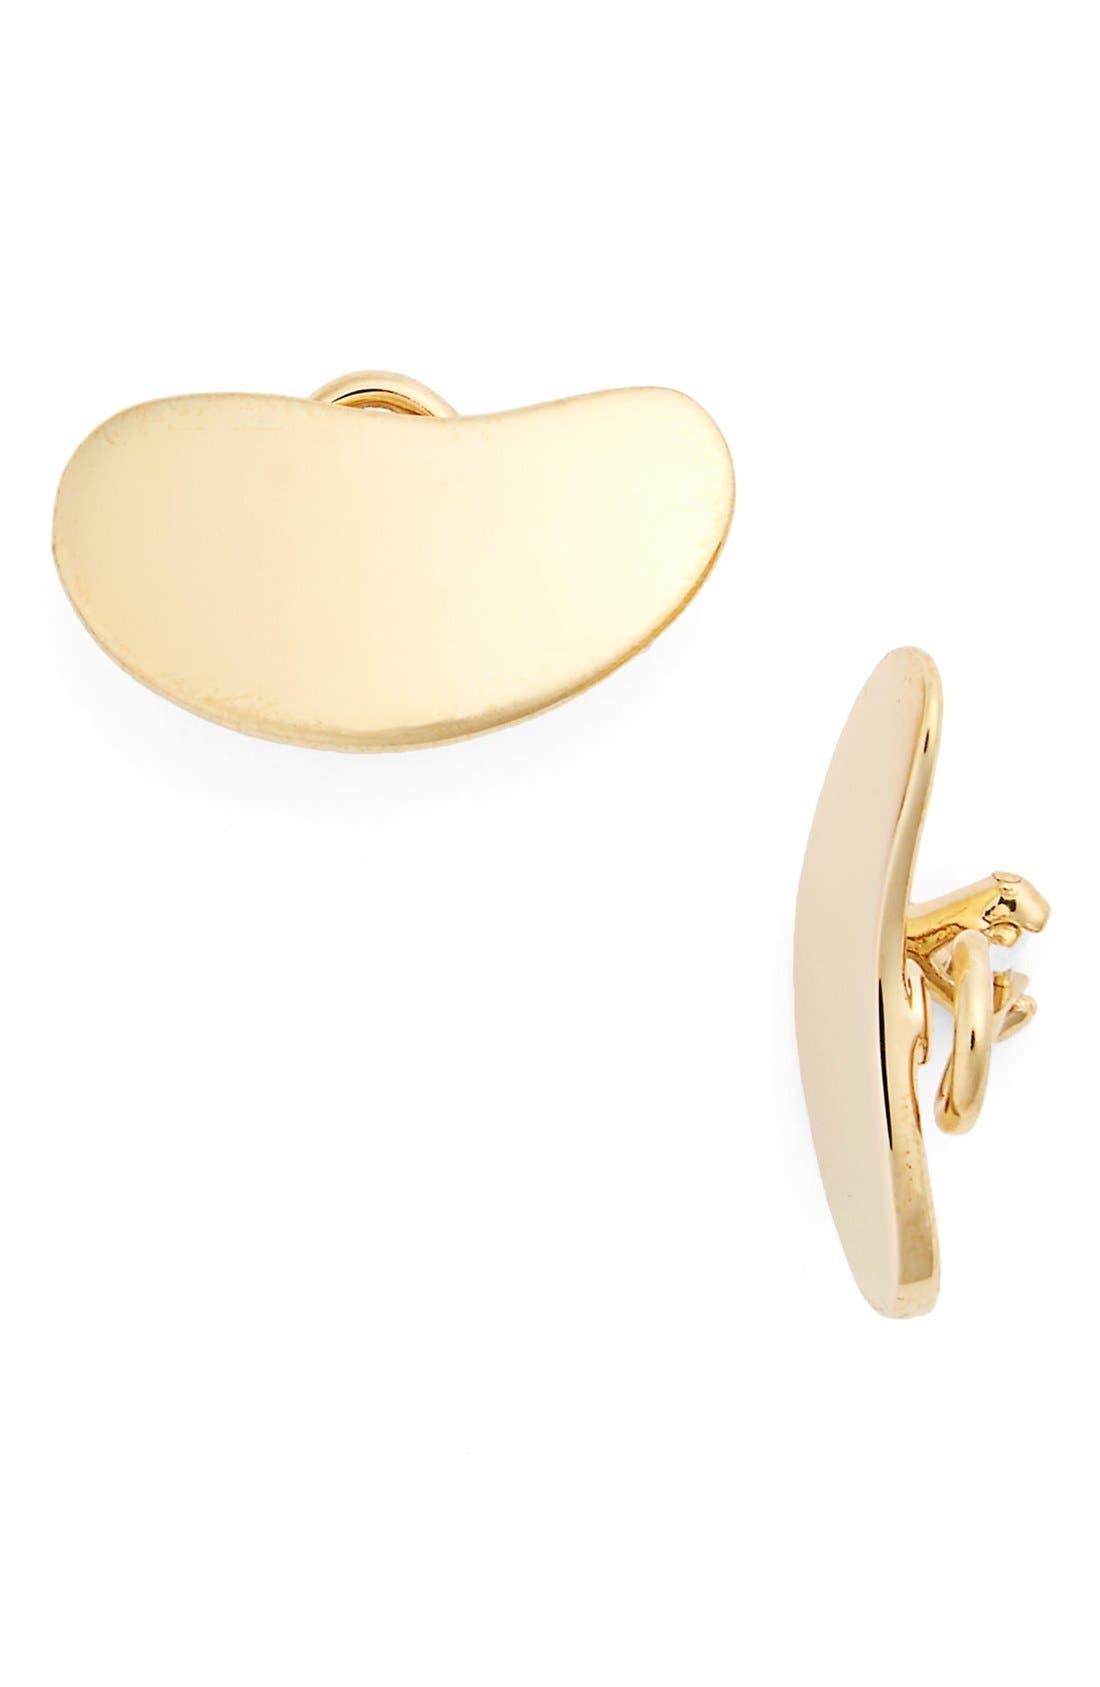 Alternate Image 1 Selected - Charlotte Chesnais 'Nues' Vermeil Clip Earrings